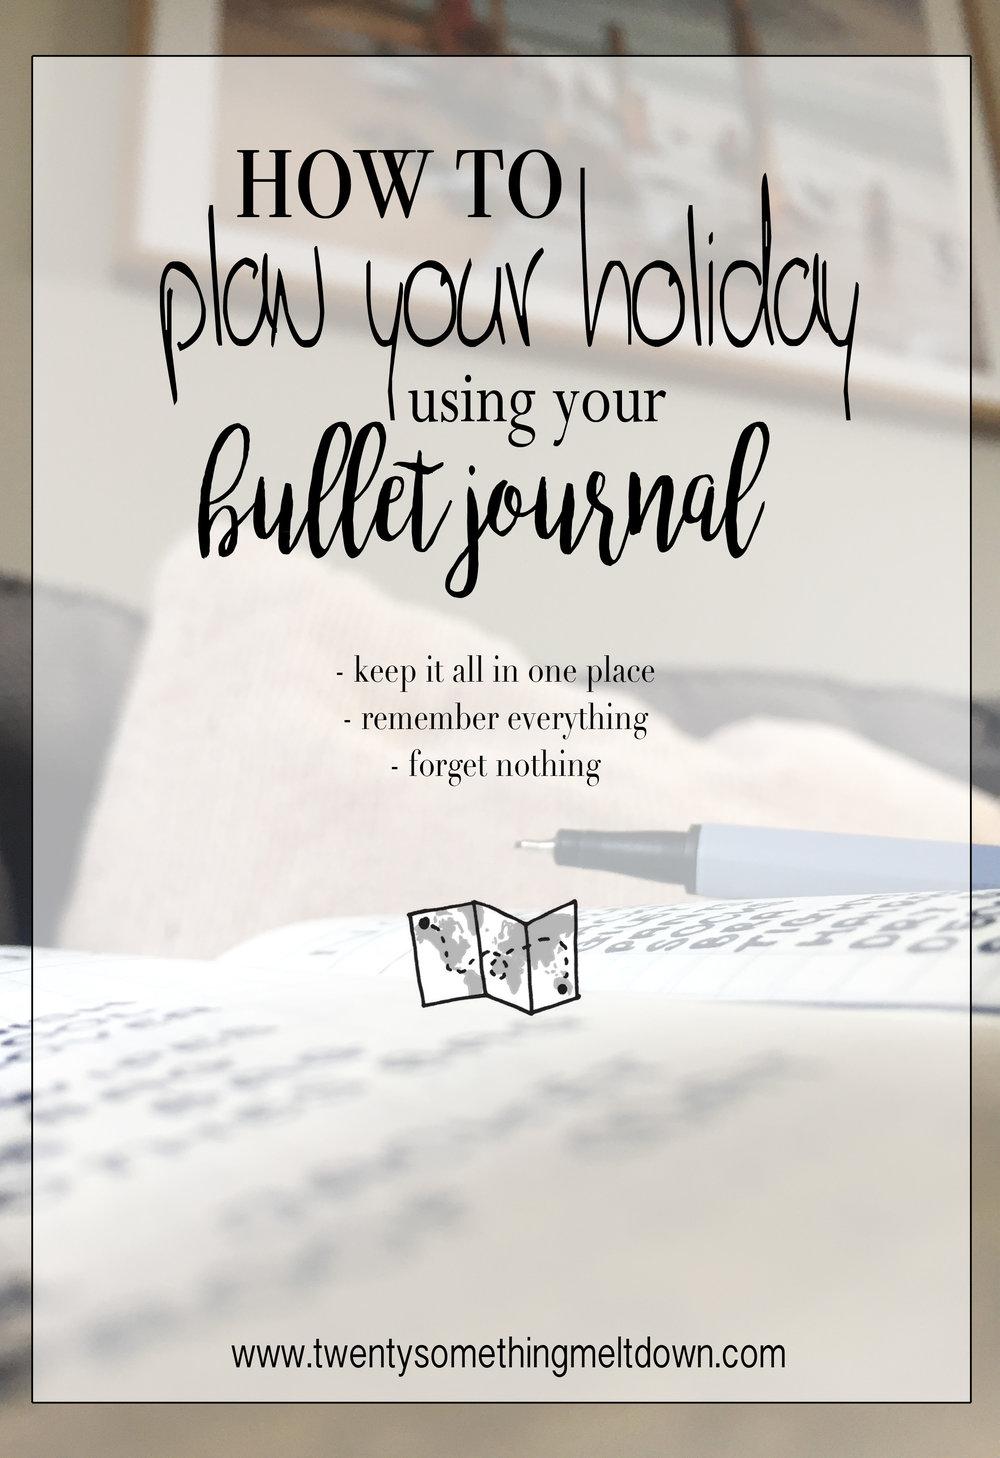 holidayjournal.jpg